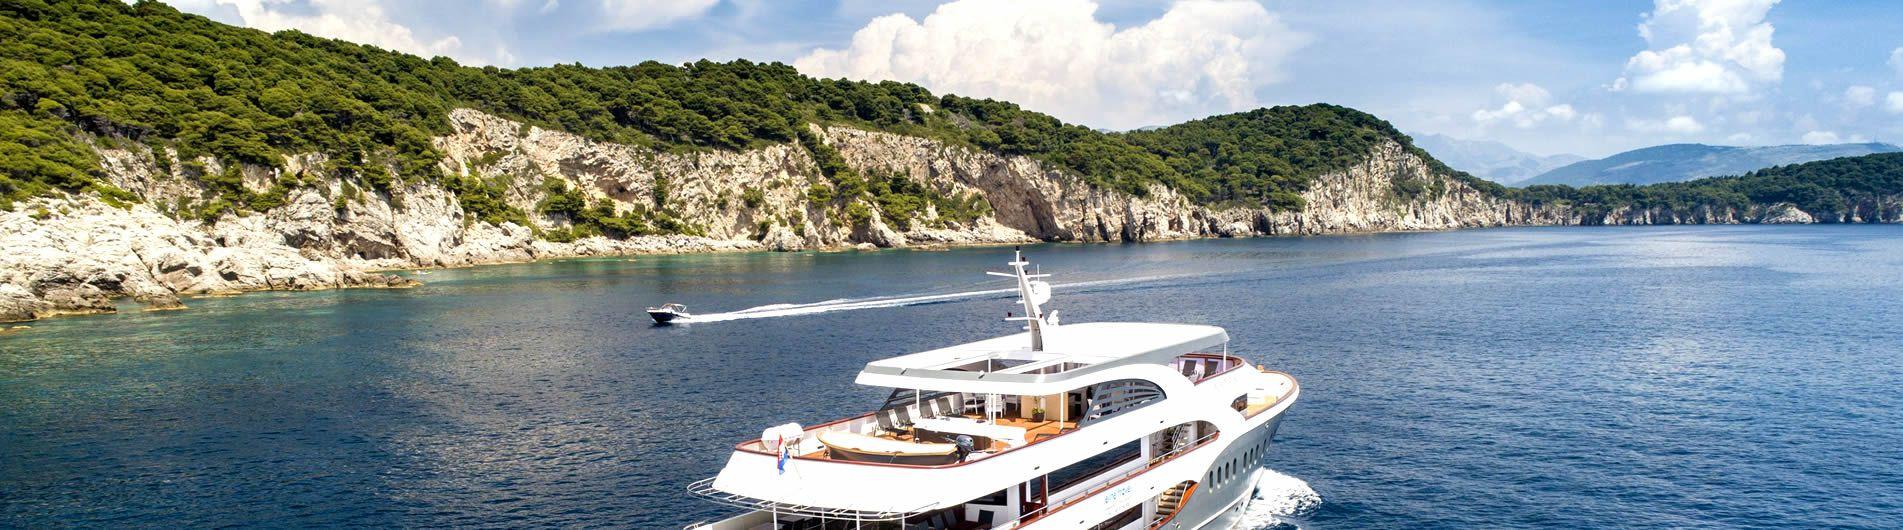 Adriatic Cruise - Optional Cruise Combination